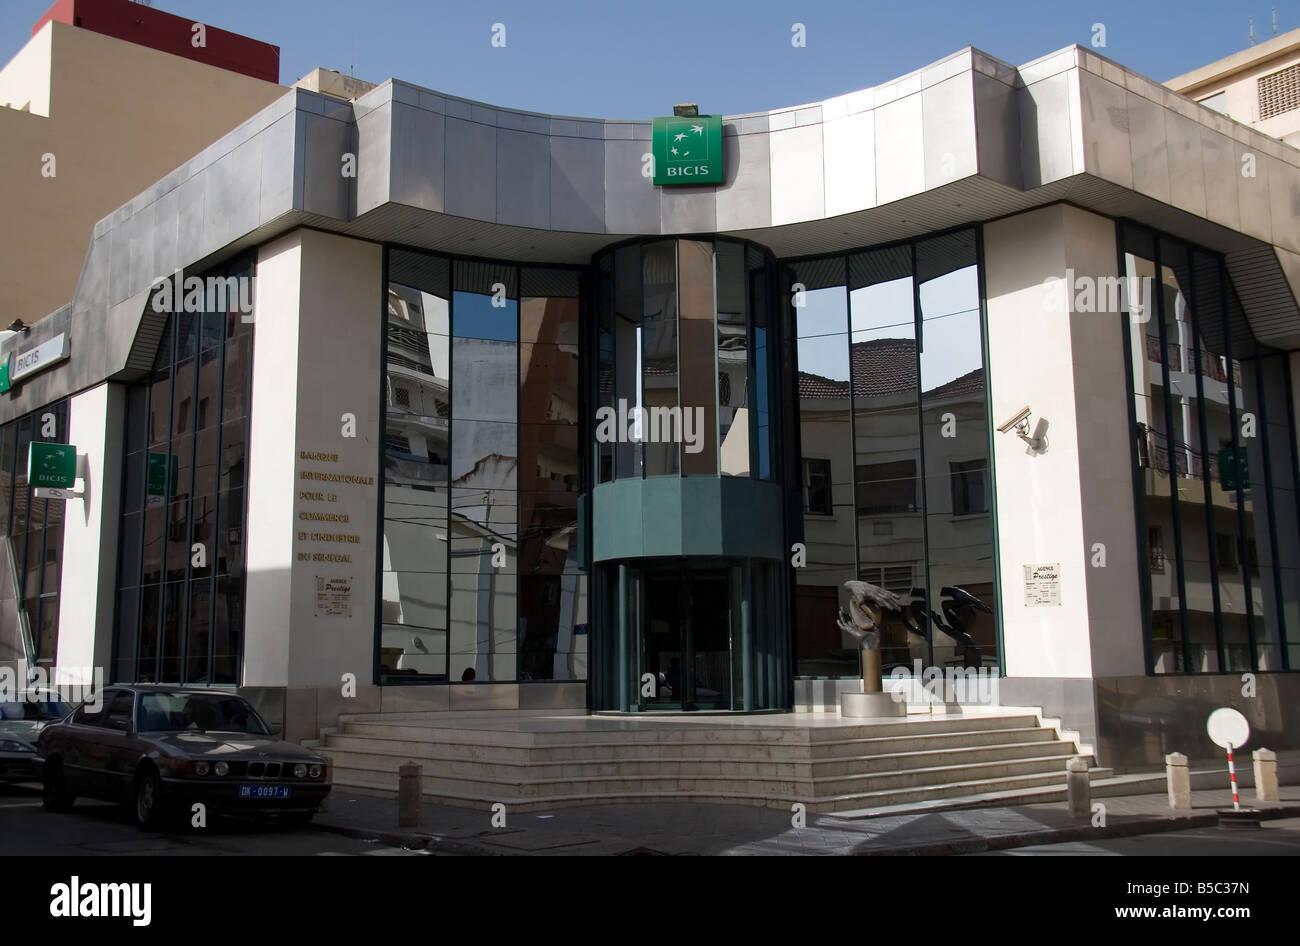 International Bank of Senegal for Commerce and Industry BICIS Dakar Senegal - Stock Image